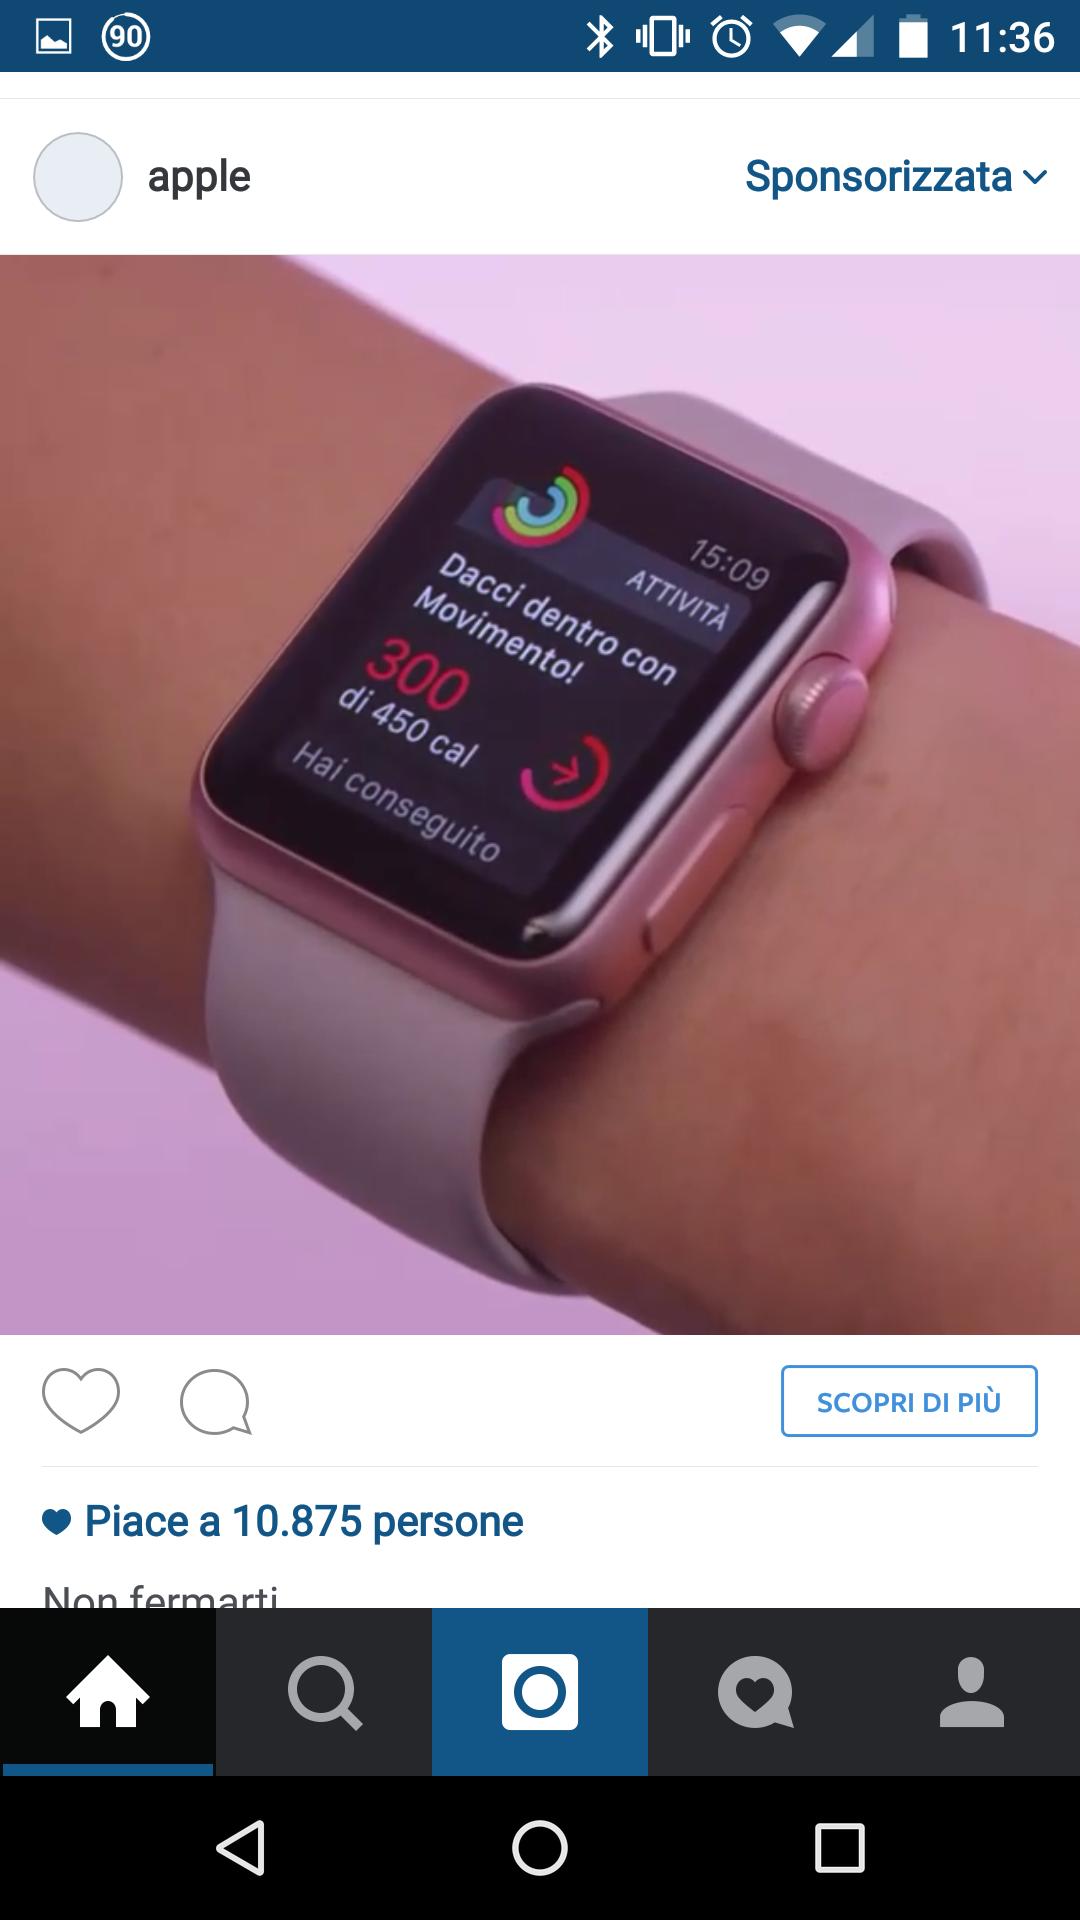 adv_instagram_apple.png